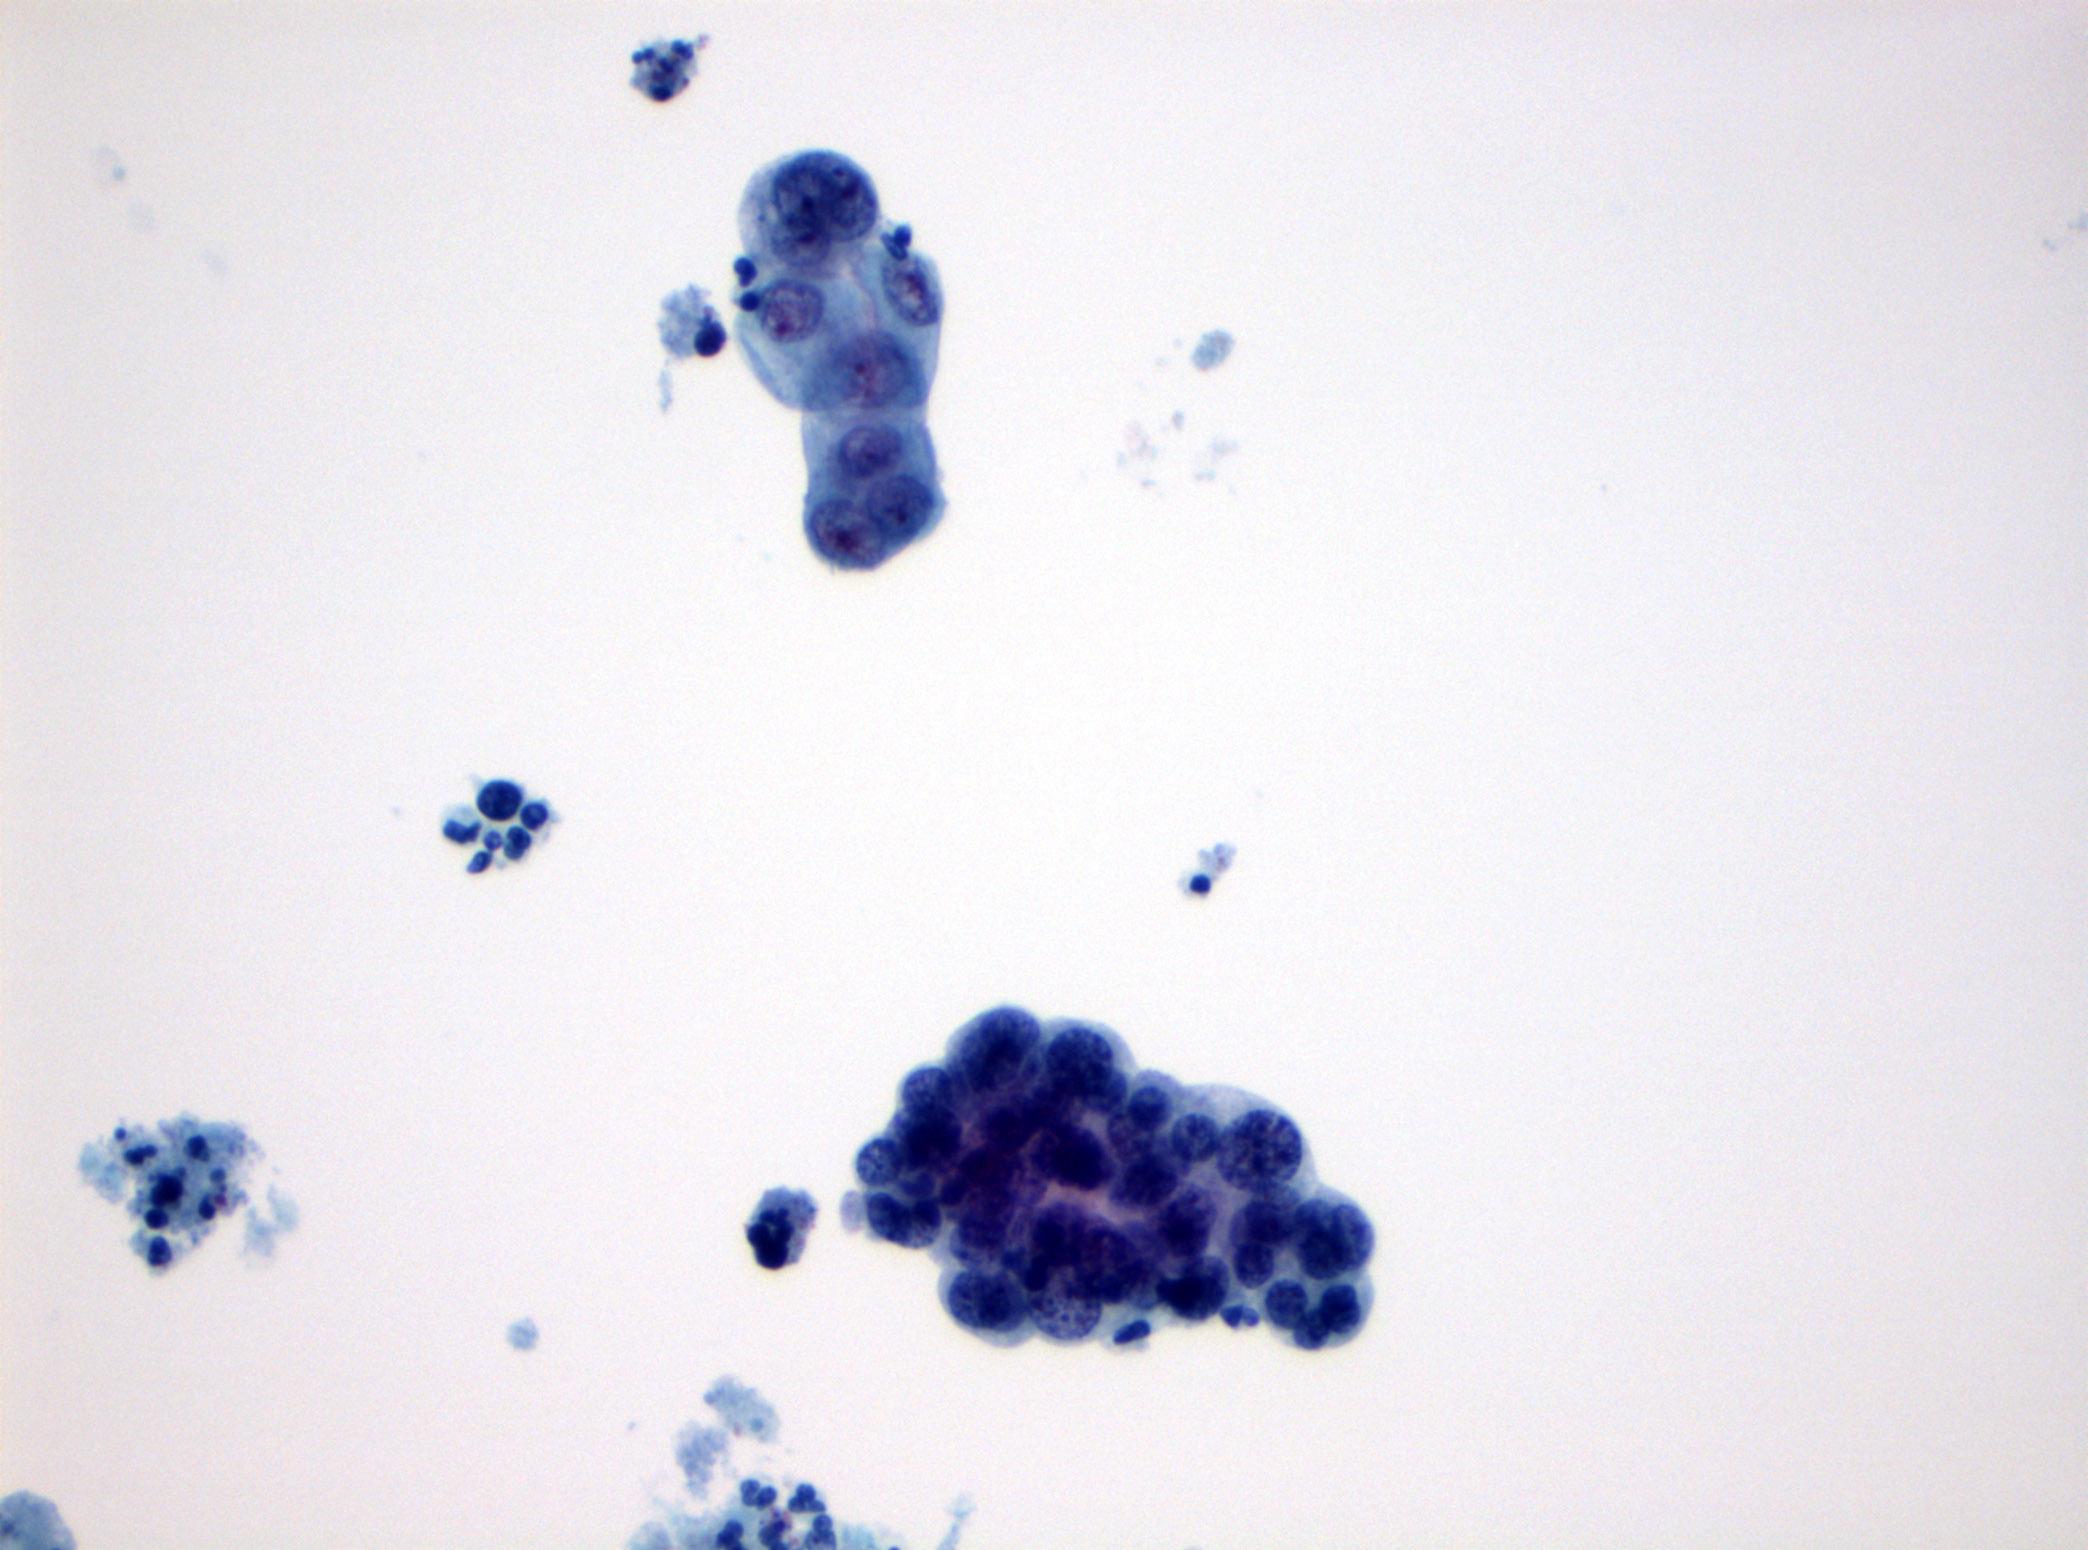 High grade cytology